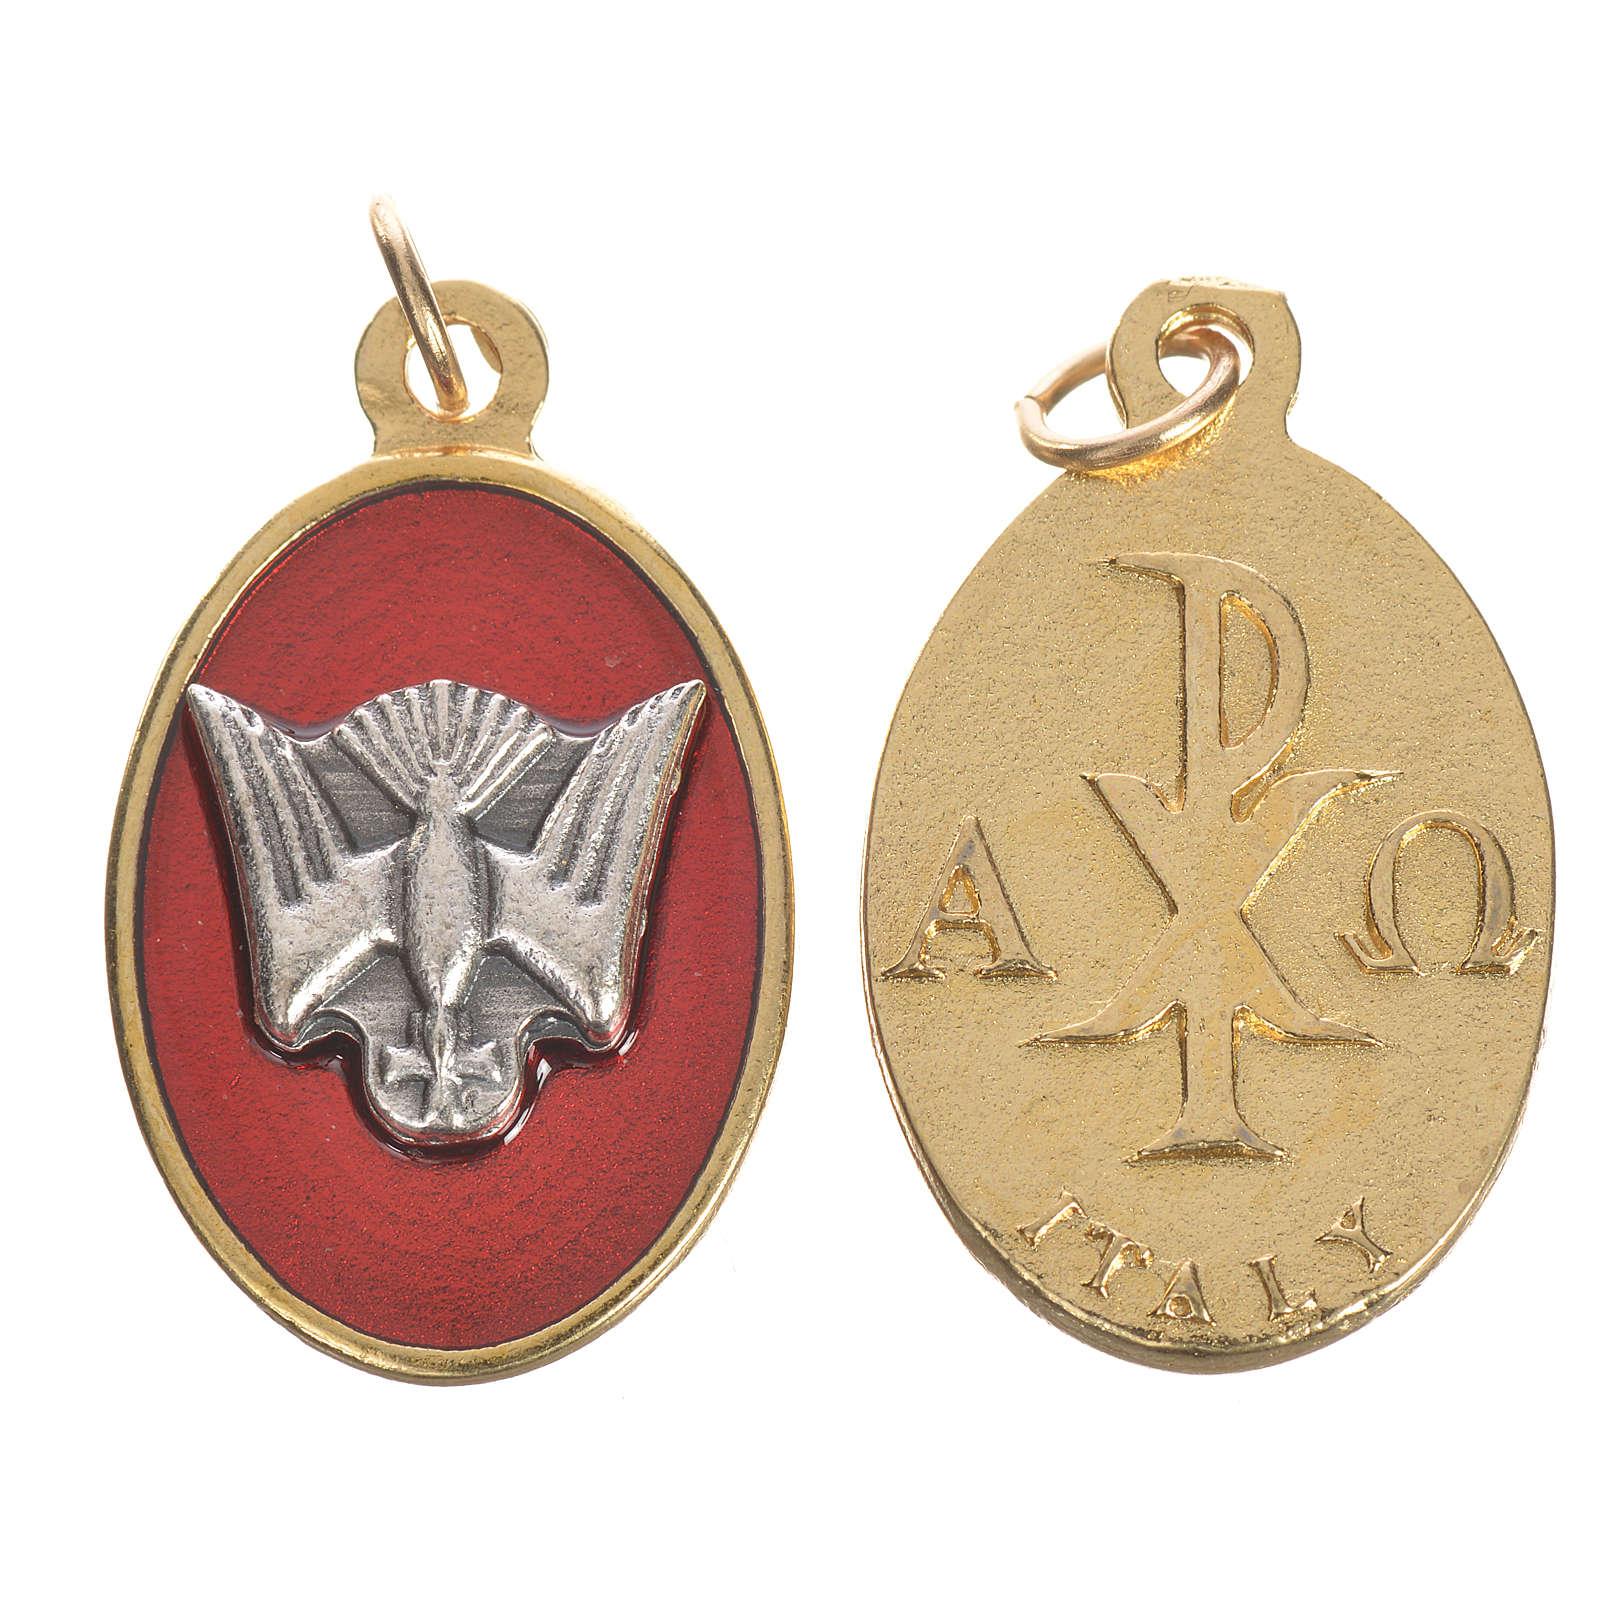 Medaglia Spirito Santo metallo smalto rosso 2,2 cm 4